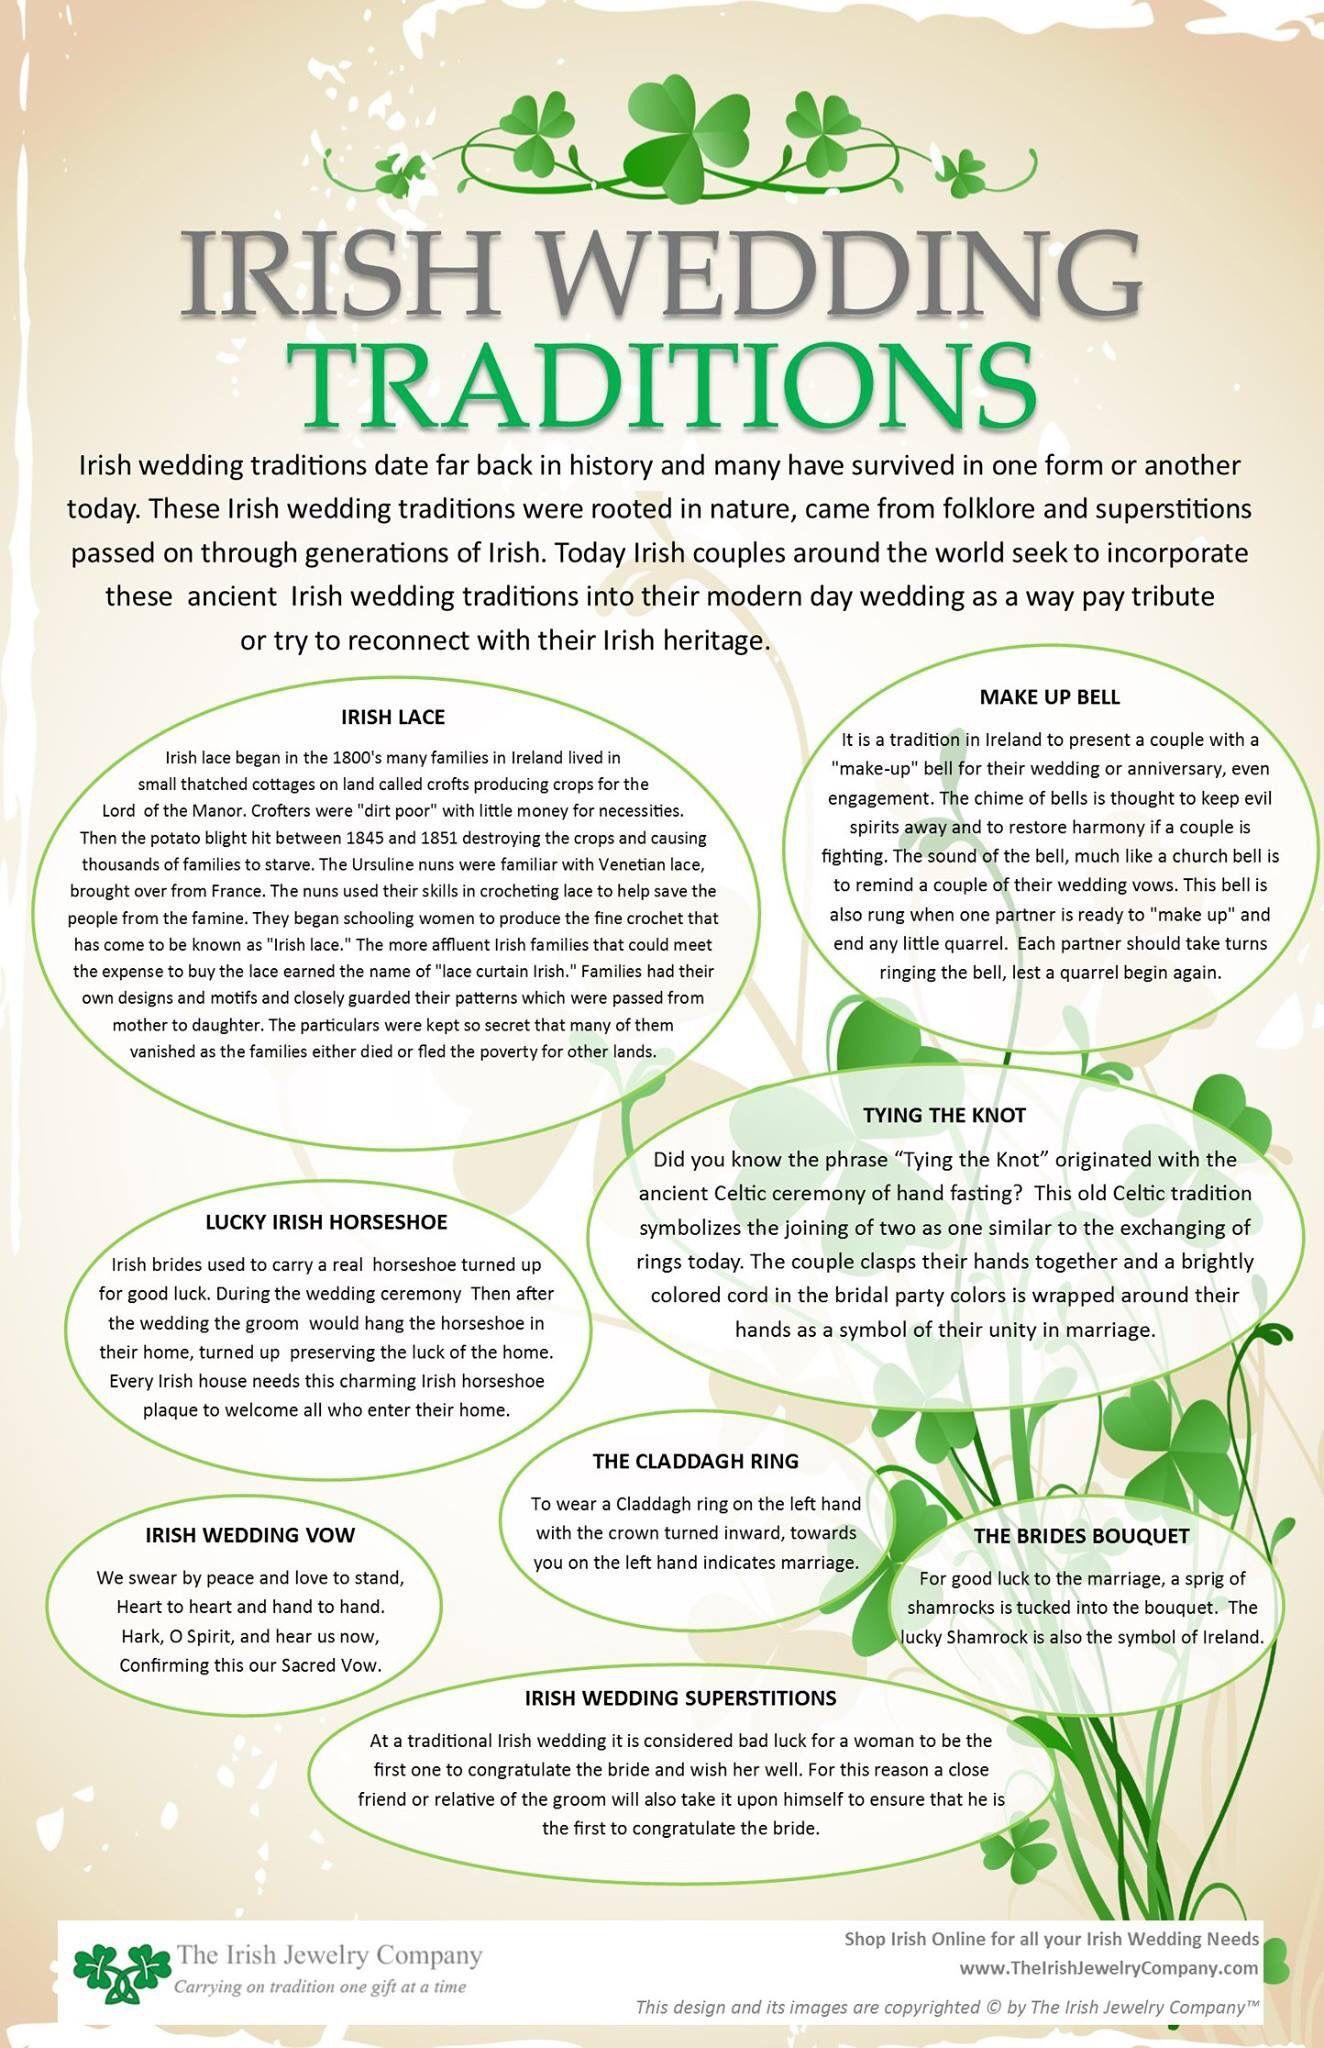 Pin by Linda Horne on Genealogy Irish wedding traditions